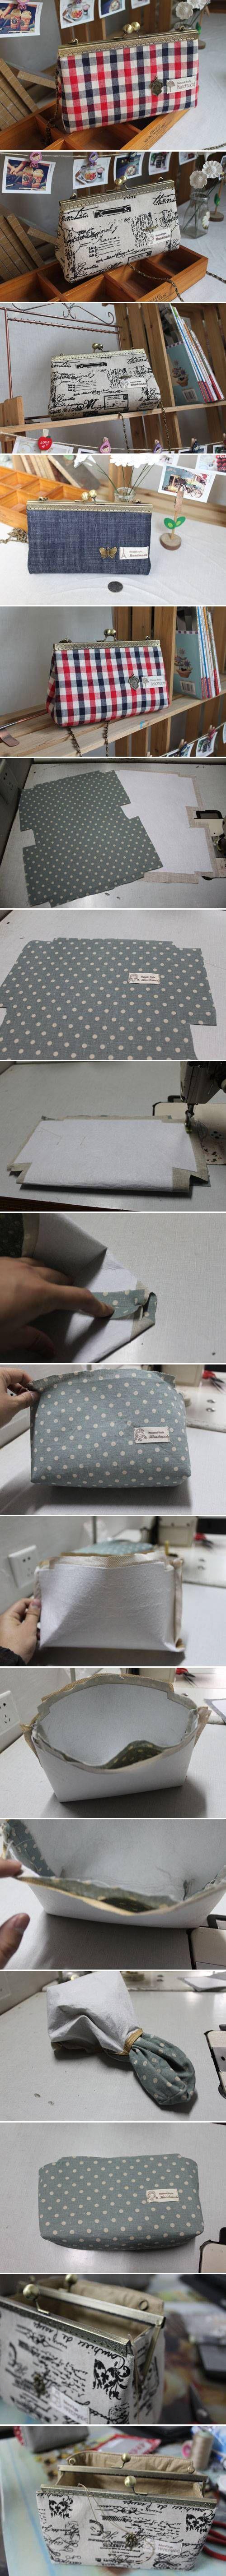 DIY Simple Handbag DIY Projects | UsefulDIY.com Follow Us on Facebook --> https://www.facebook.com/UsefulDiy